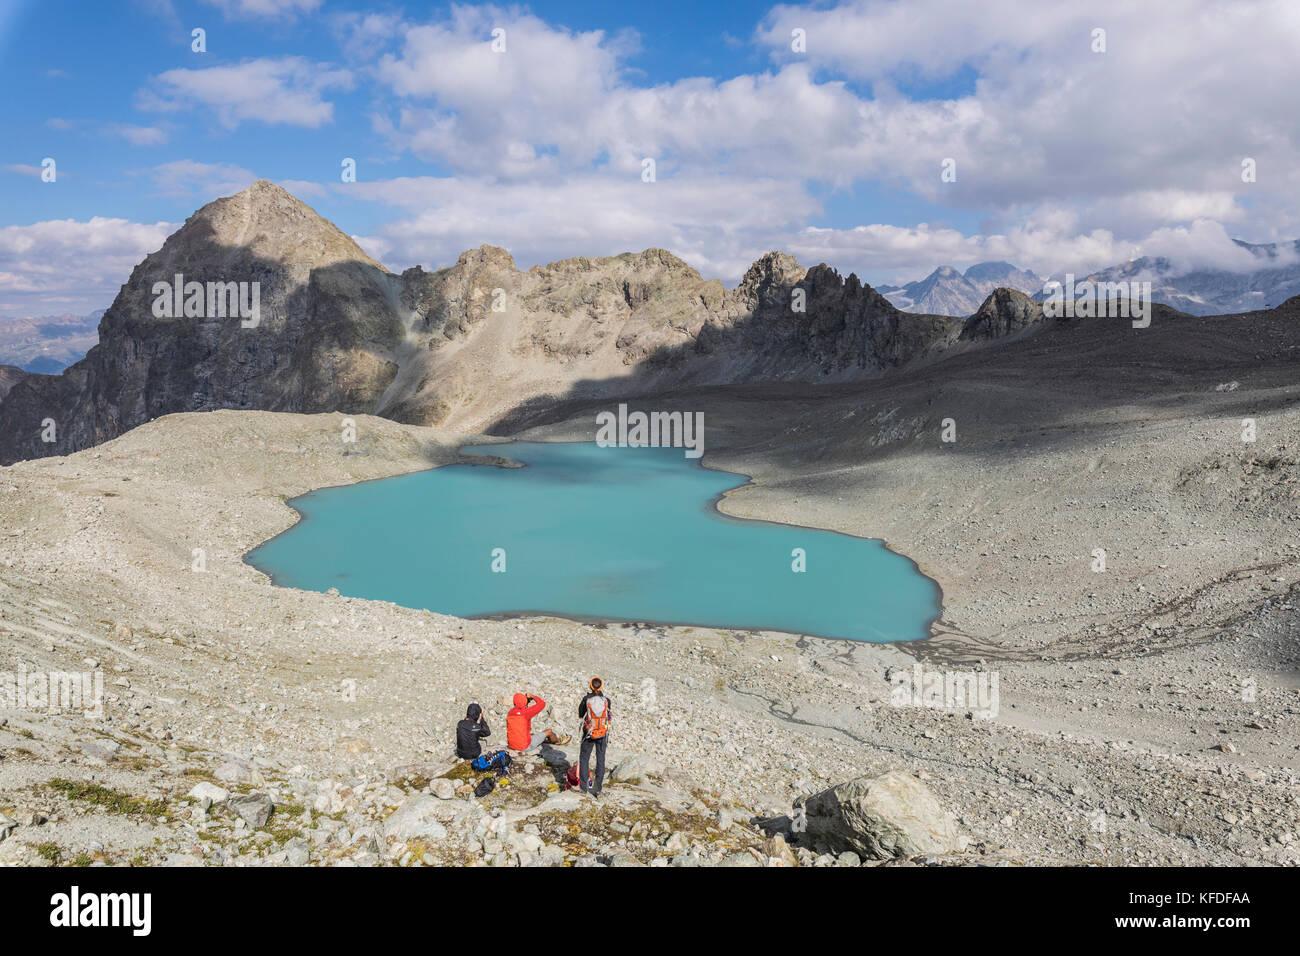 Fotografen bei lej Lagrev im Sommer, Silvaplana, Graubünden, Engadin, Schweiz Stockbild